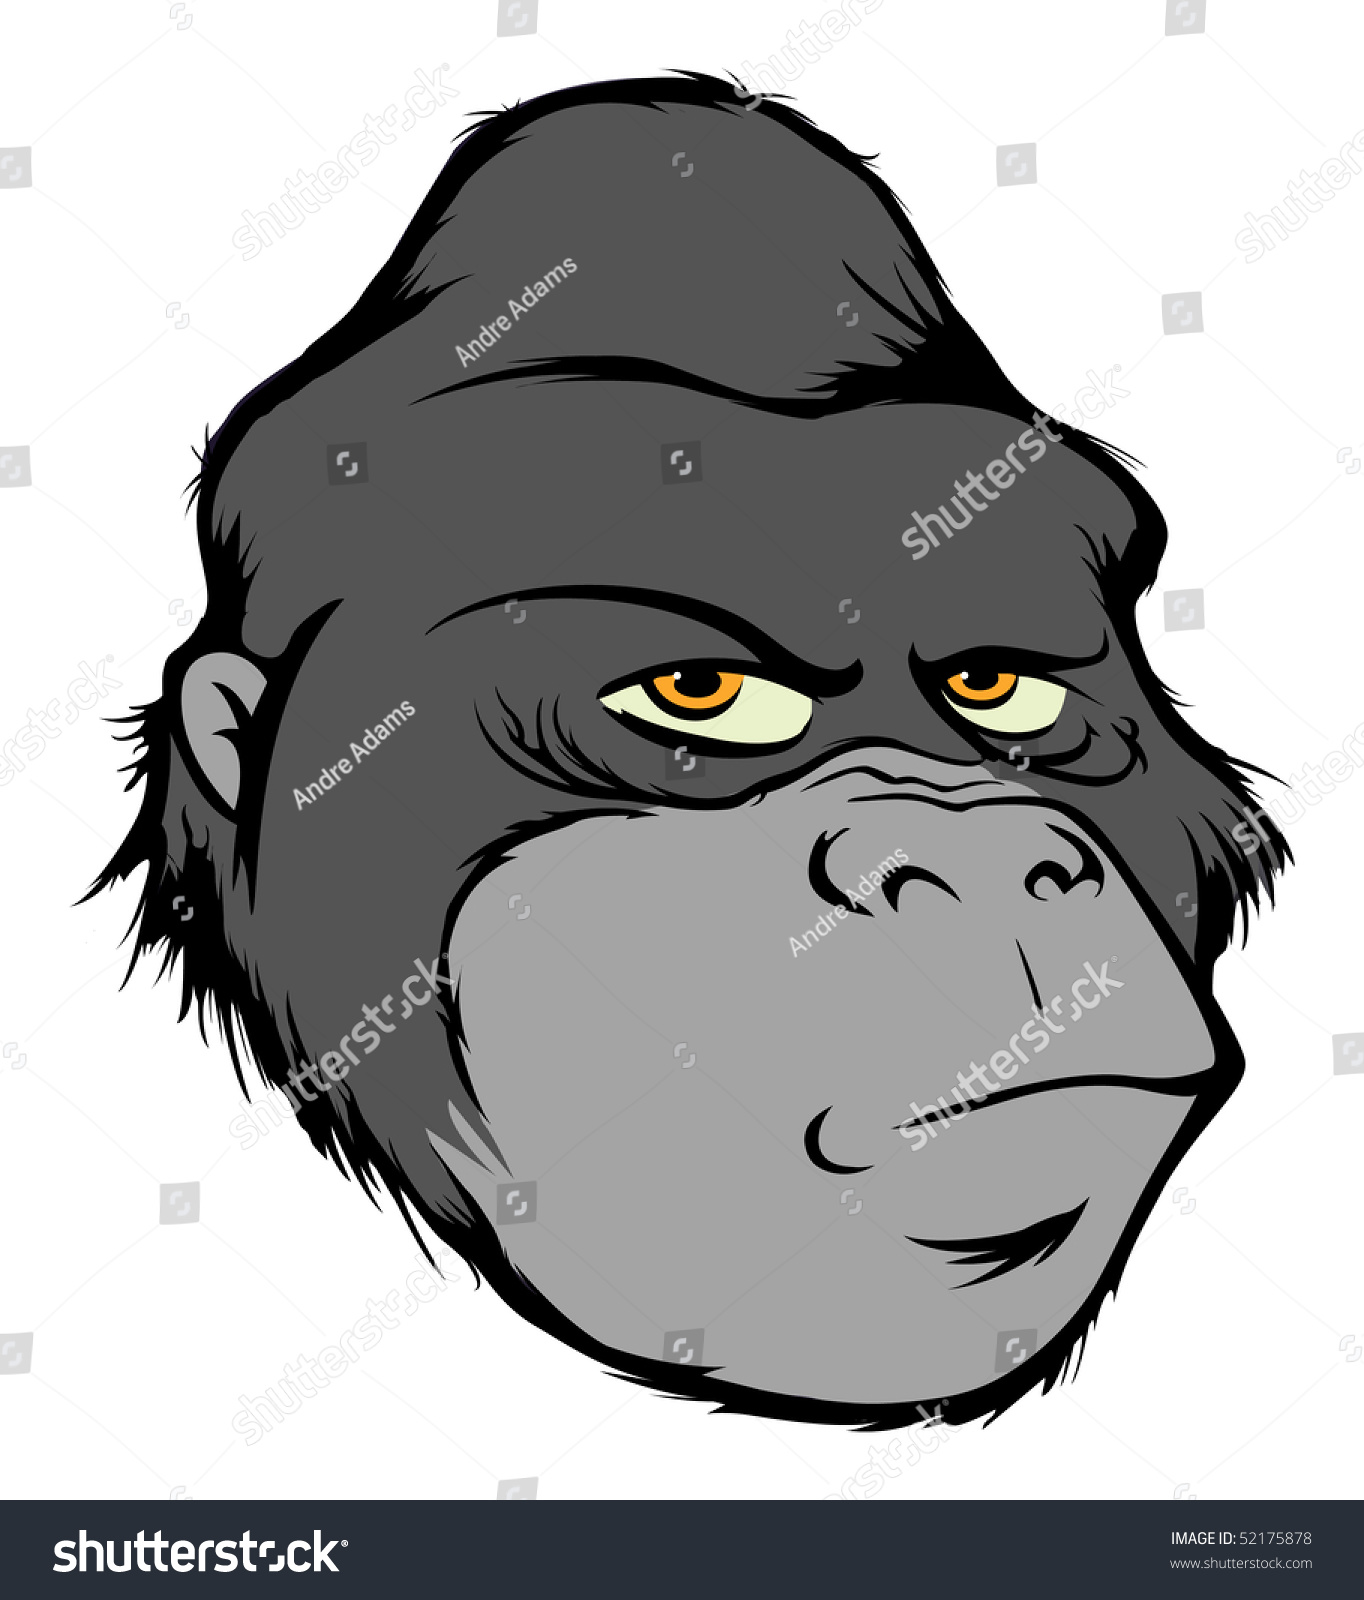 Gorilla vector head - photo#15